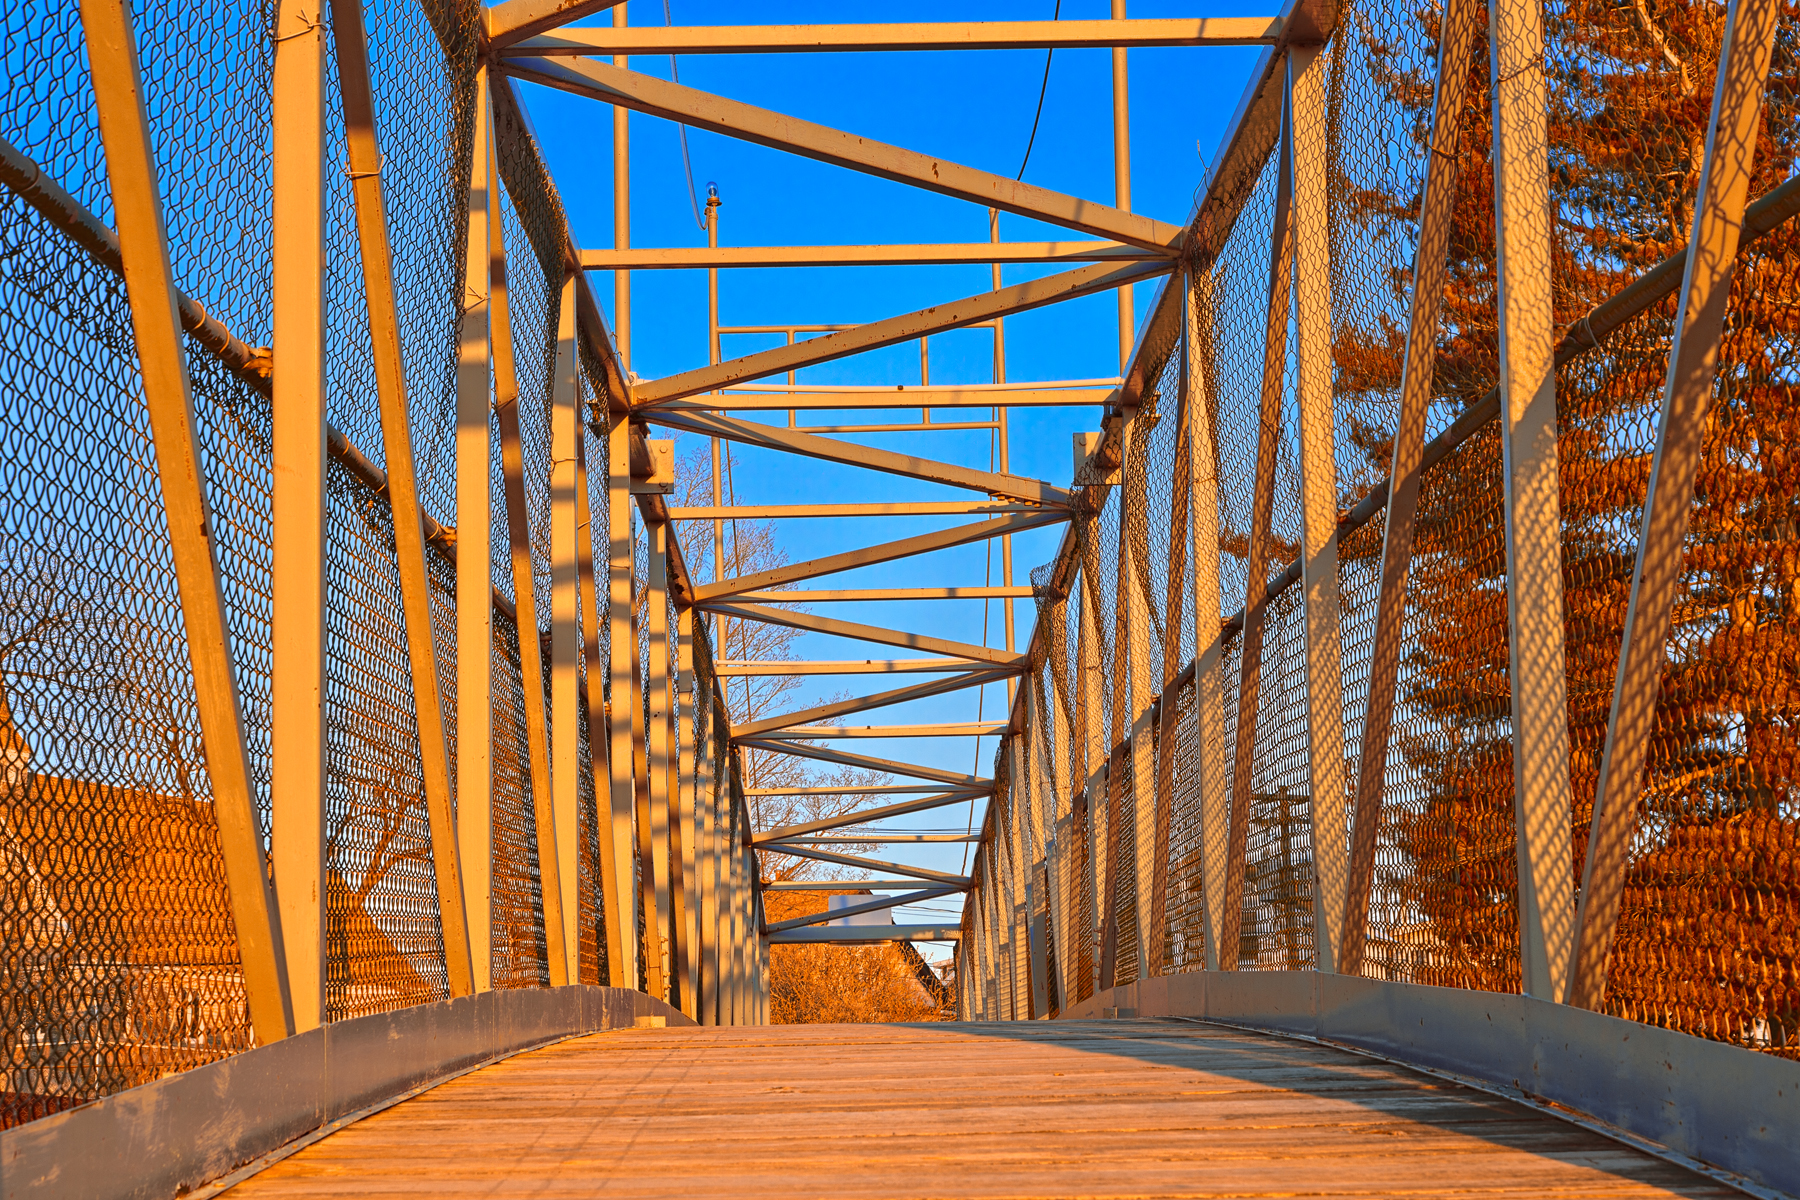 Golden sunset bridge - hdr photo